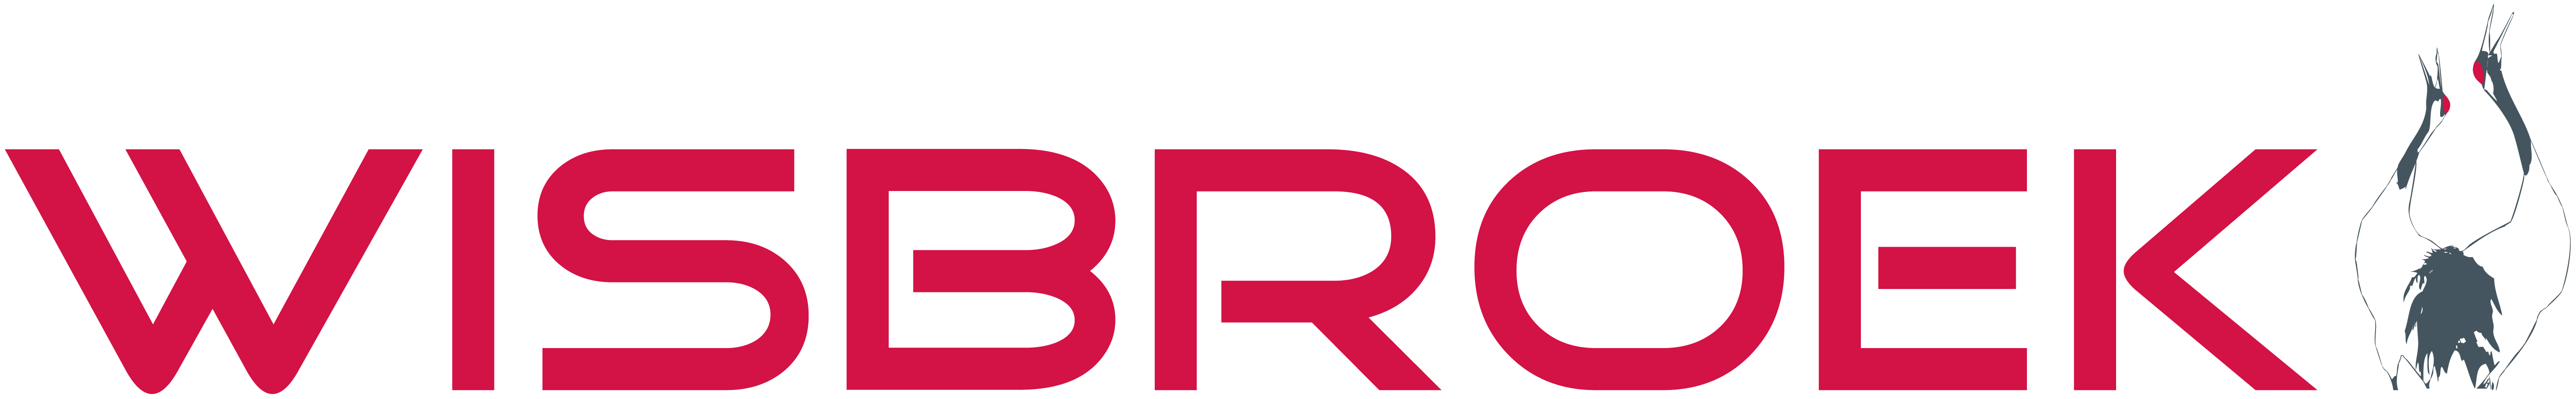 Logo-Wisbroek